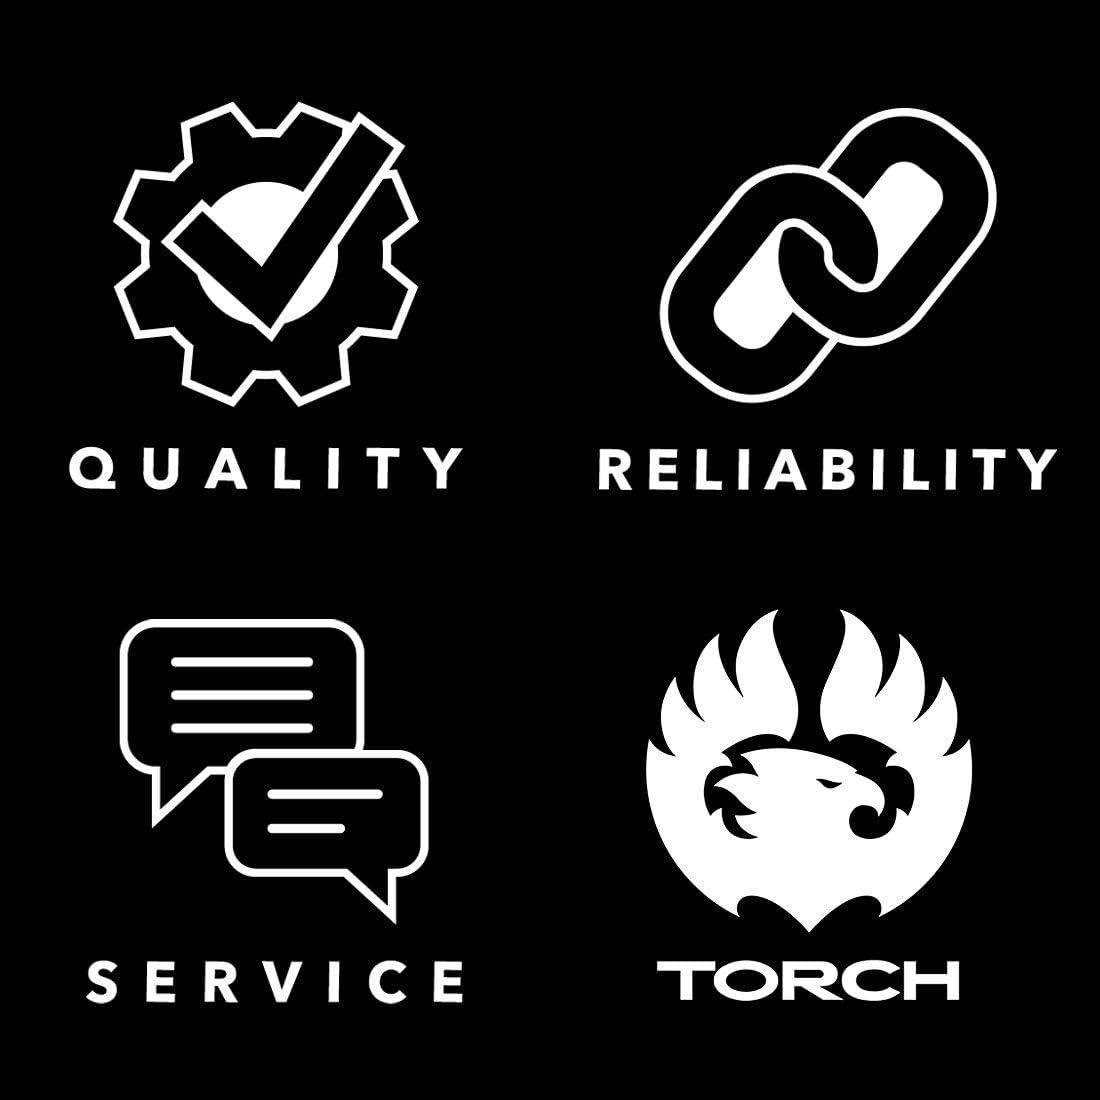 "TORCH 3 Front 3/"" Rear LIFT Kit For Chevy Silverado GMC Sierra 4X4 4WD 6 LUG Shock Extenders"